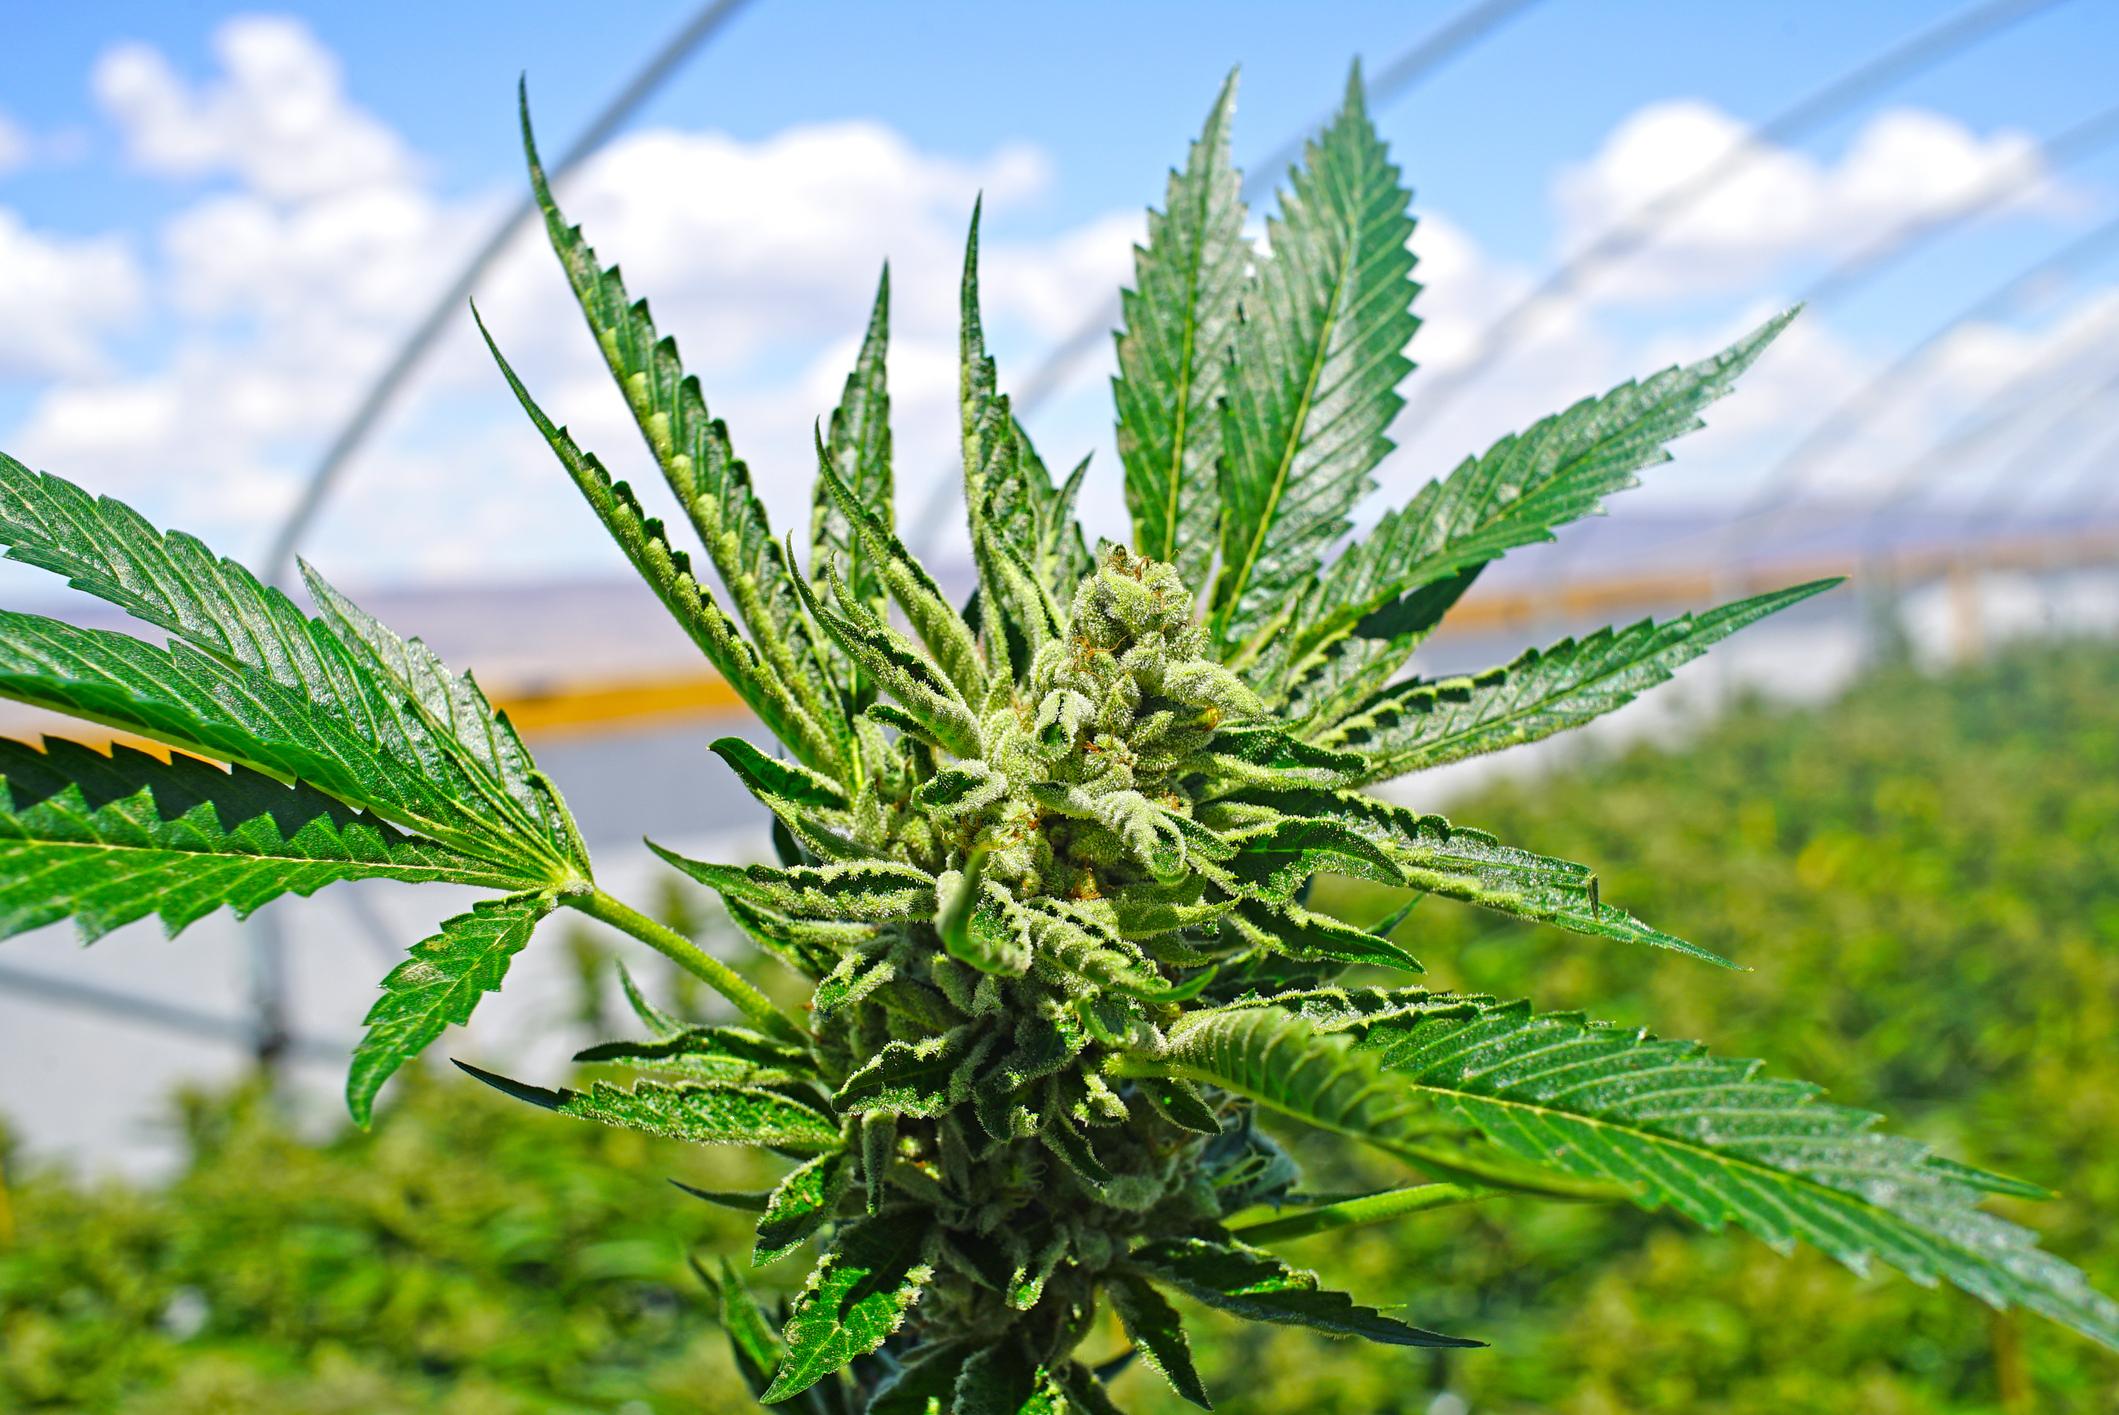 A cannabis plant growing on a hillside.